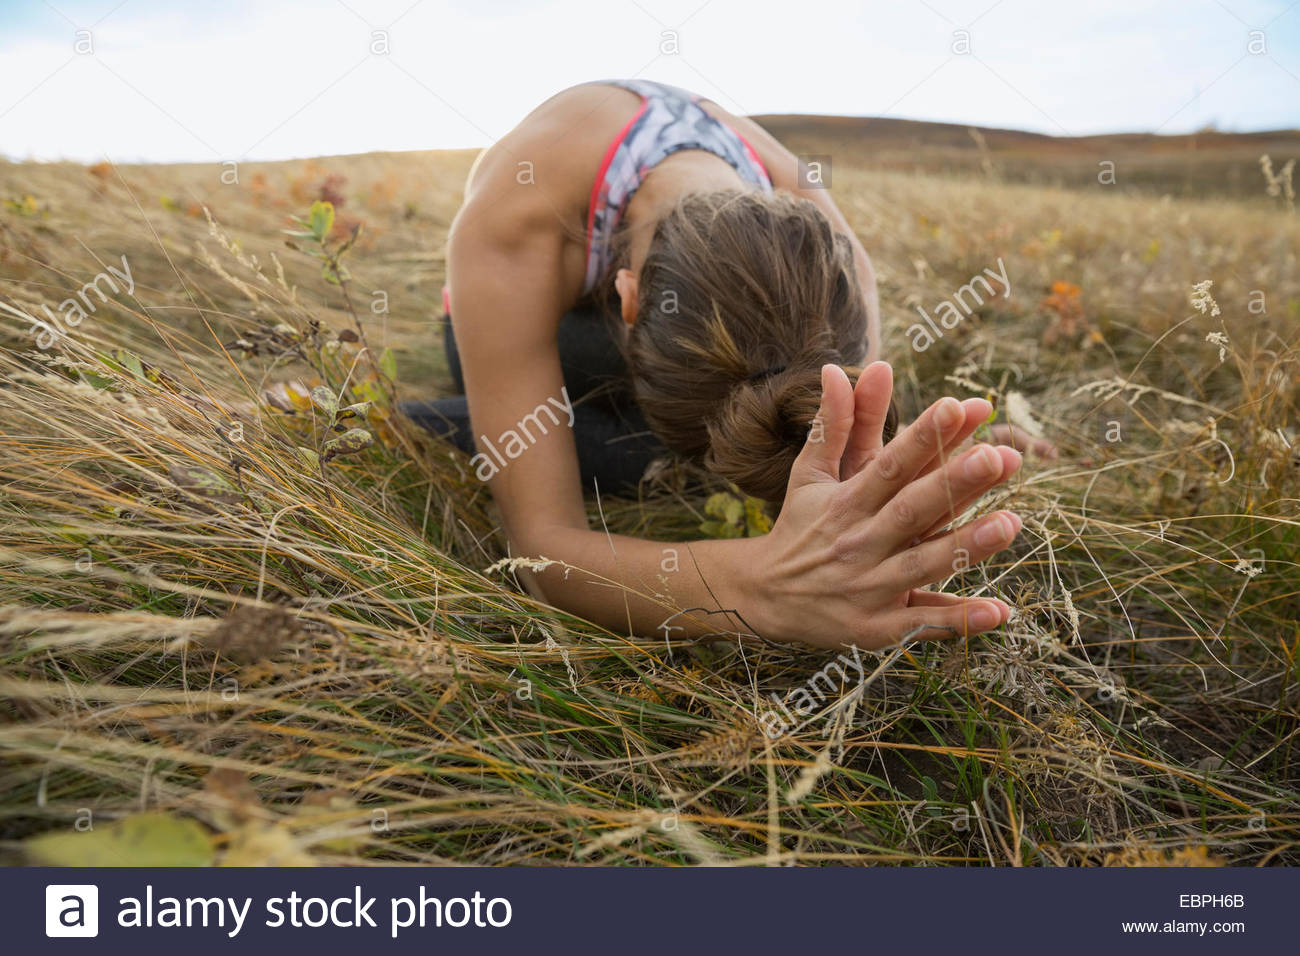 Serene woman practicing yoga in rural field - Stock Image